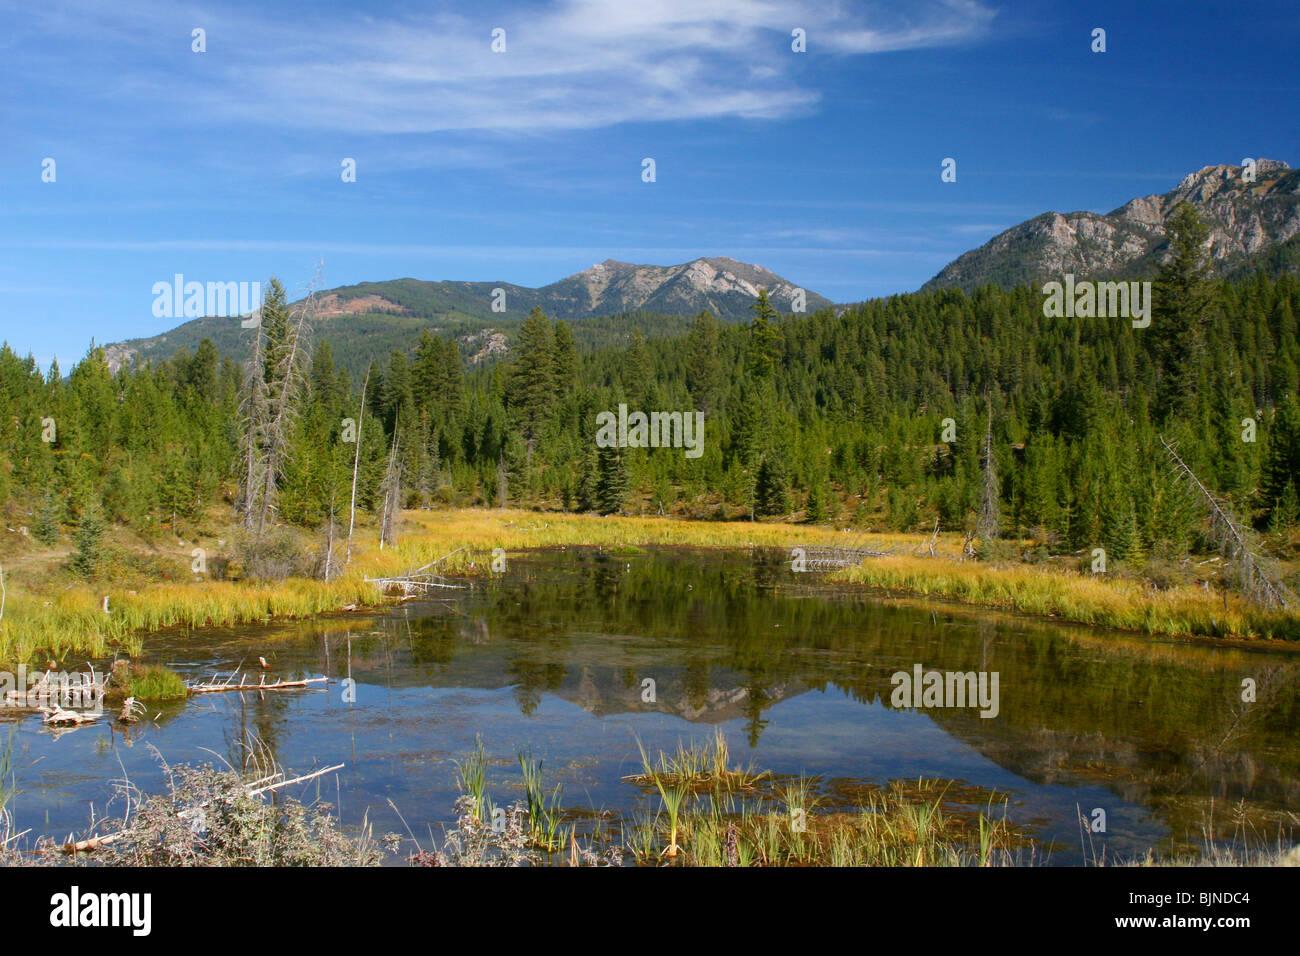 LANDSCAPE ;  Banff National Park, Alberta, Canada - Stock Image